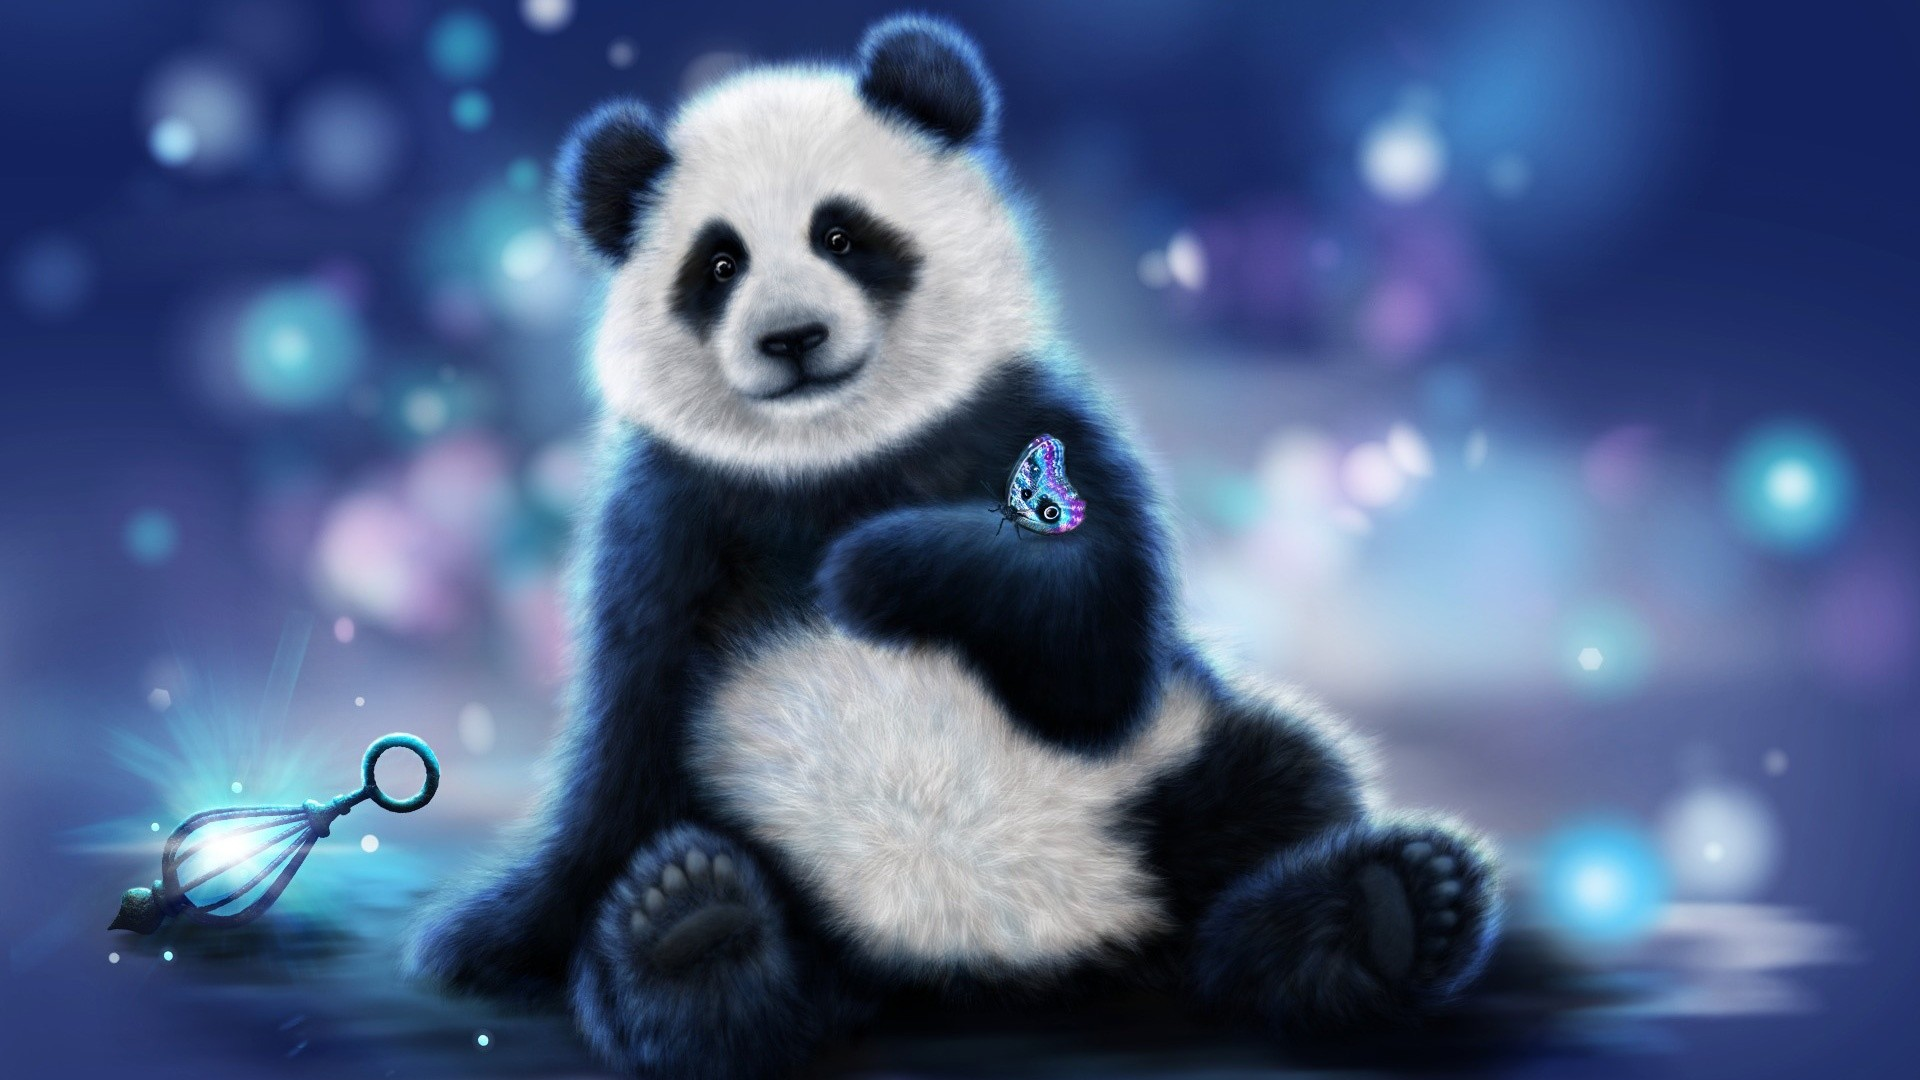 Cute Lovable Couple Wallpapers Anime Panda Wallpaper 70 Images